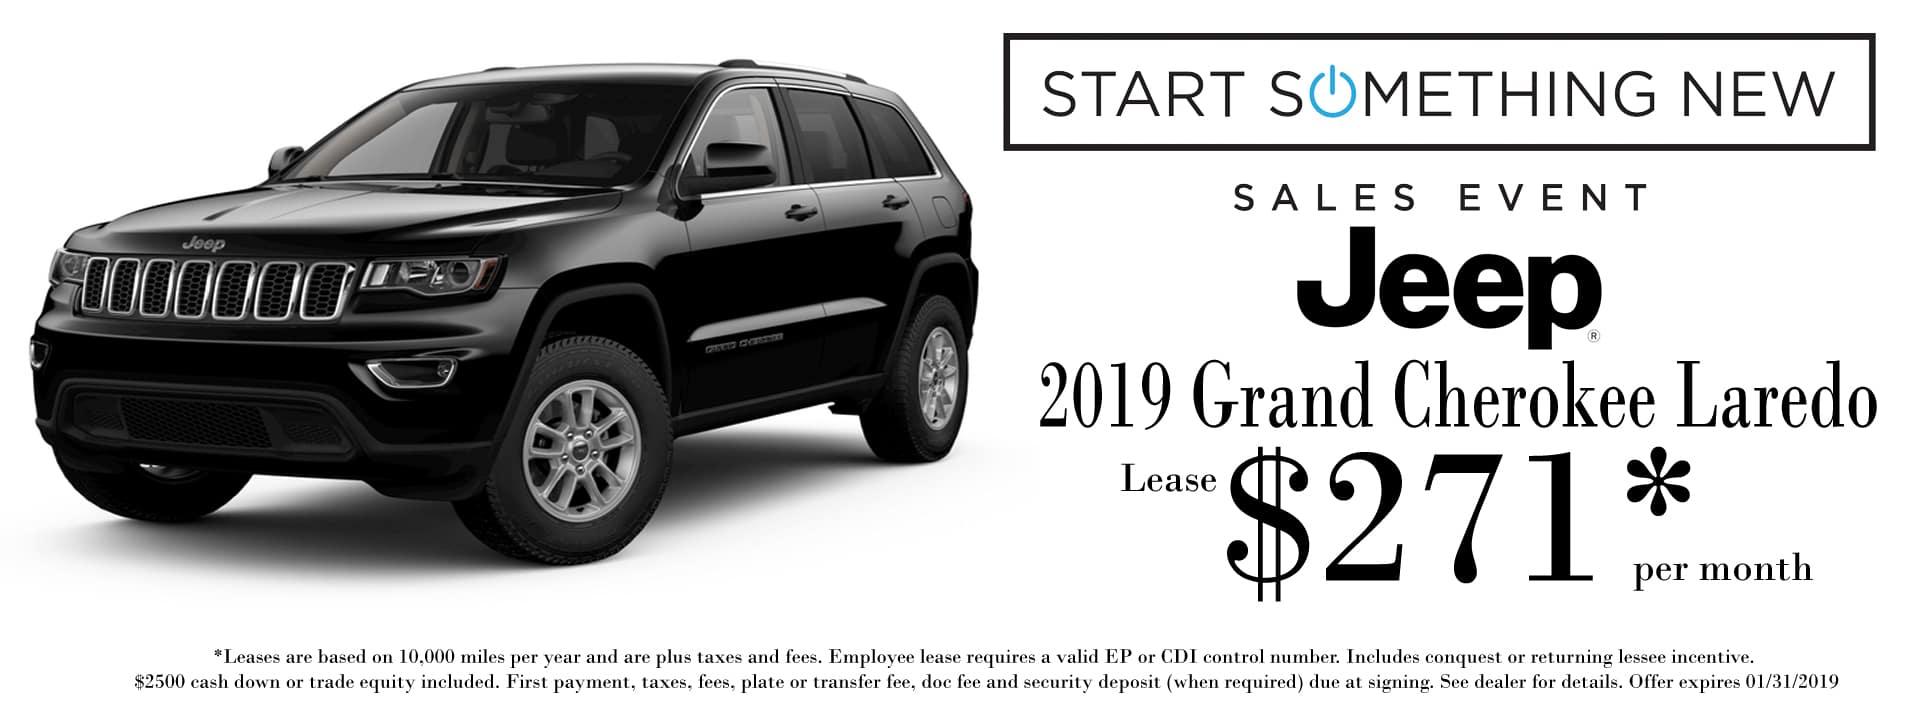 Jan 2019 Grand Cherokee Lease Special